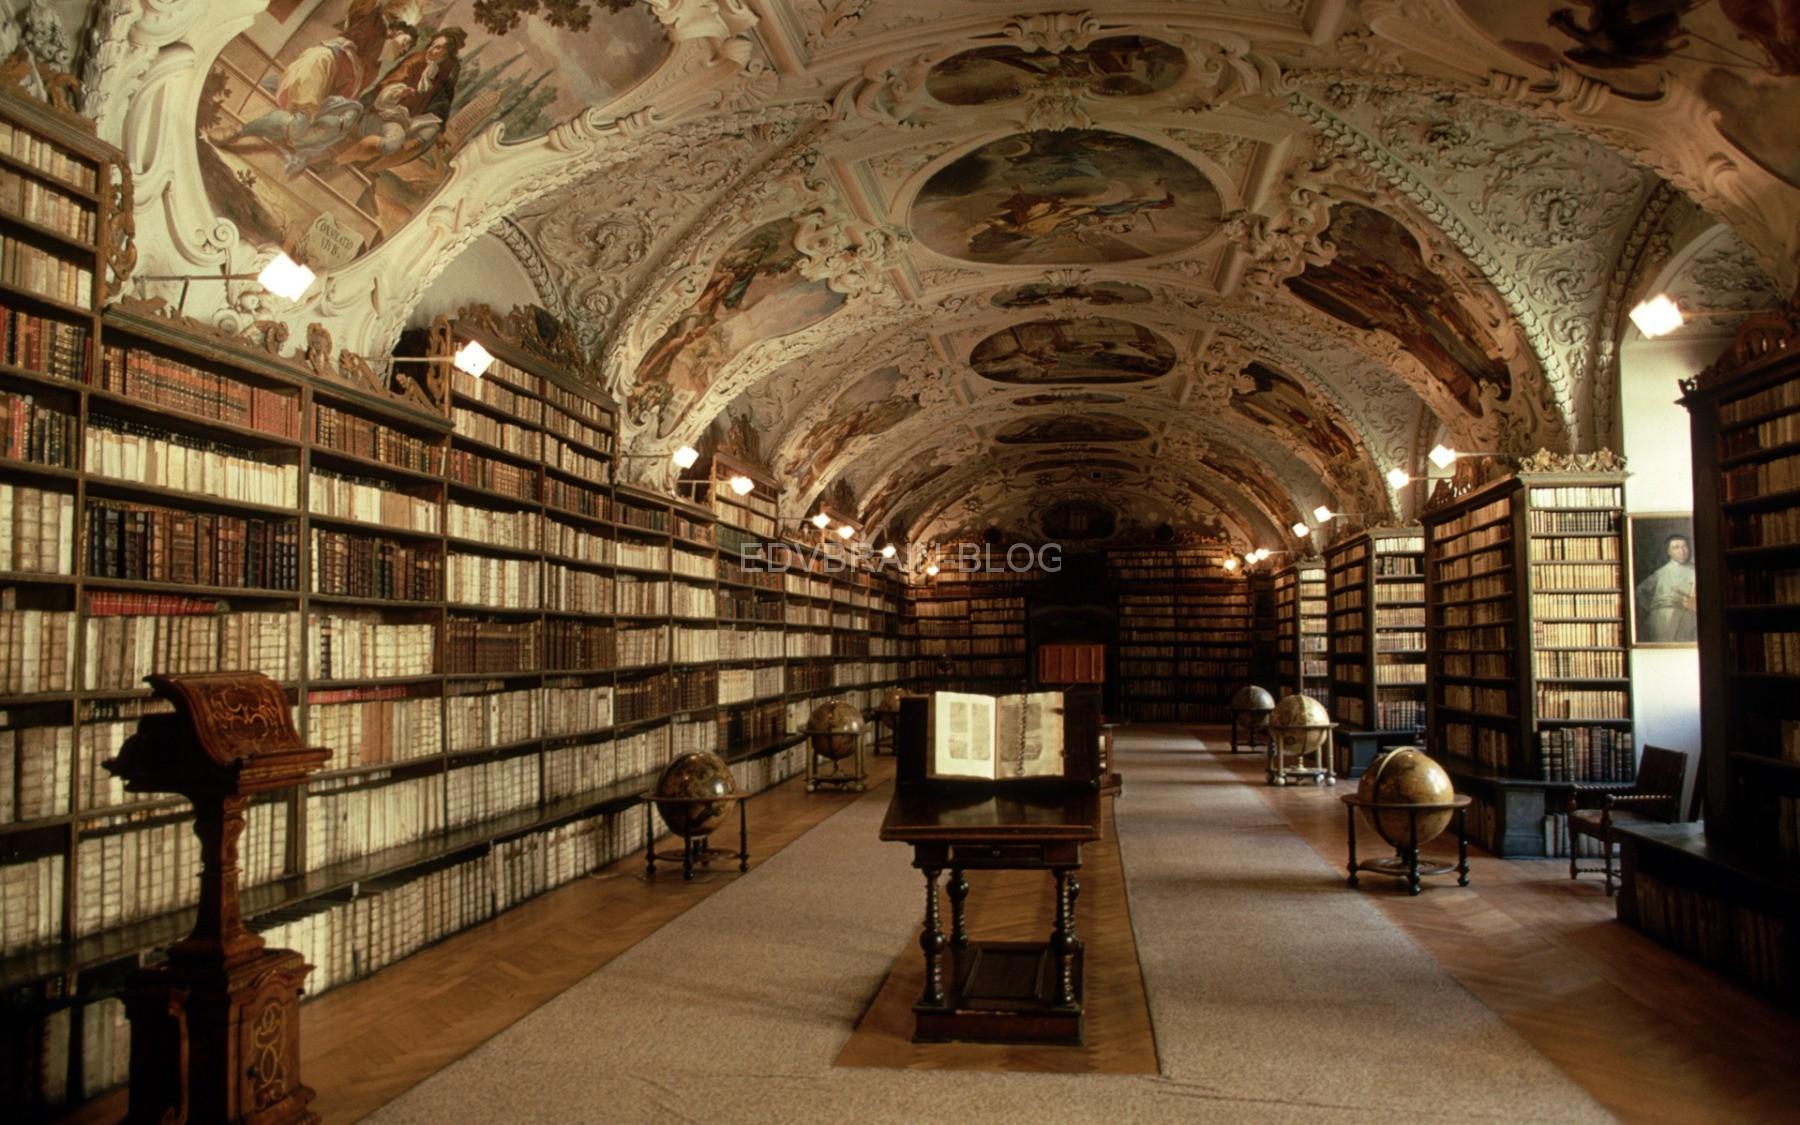 Interior of the Strahov Library, Prague, Czech Republic